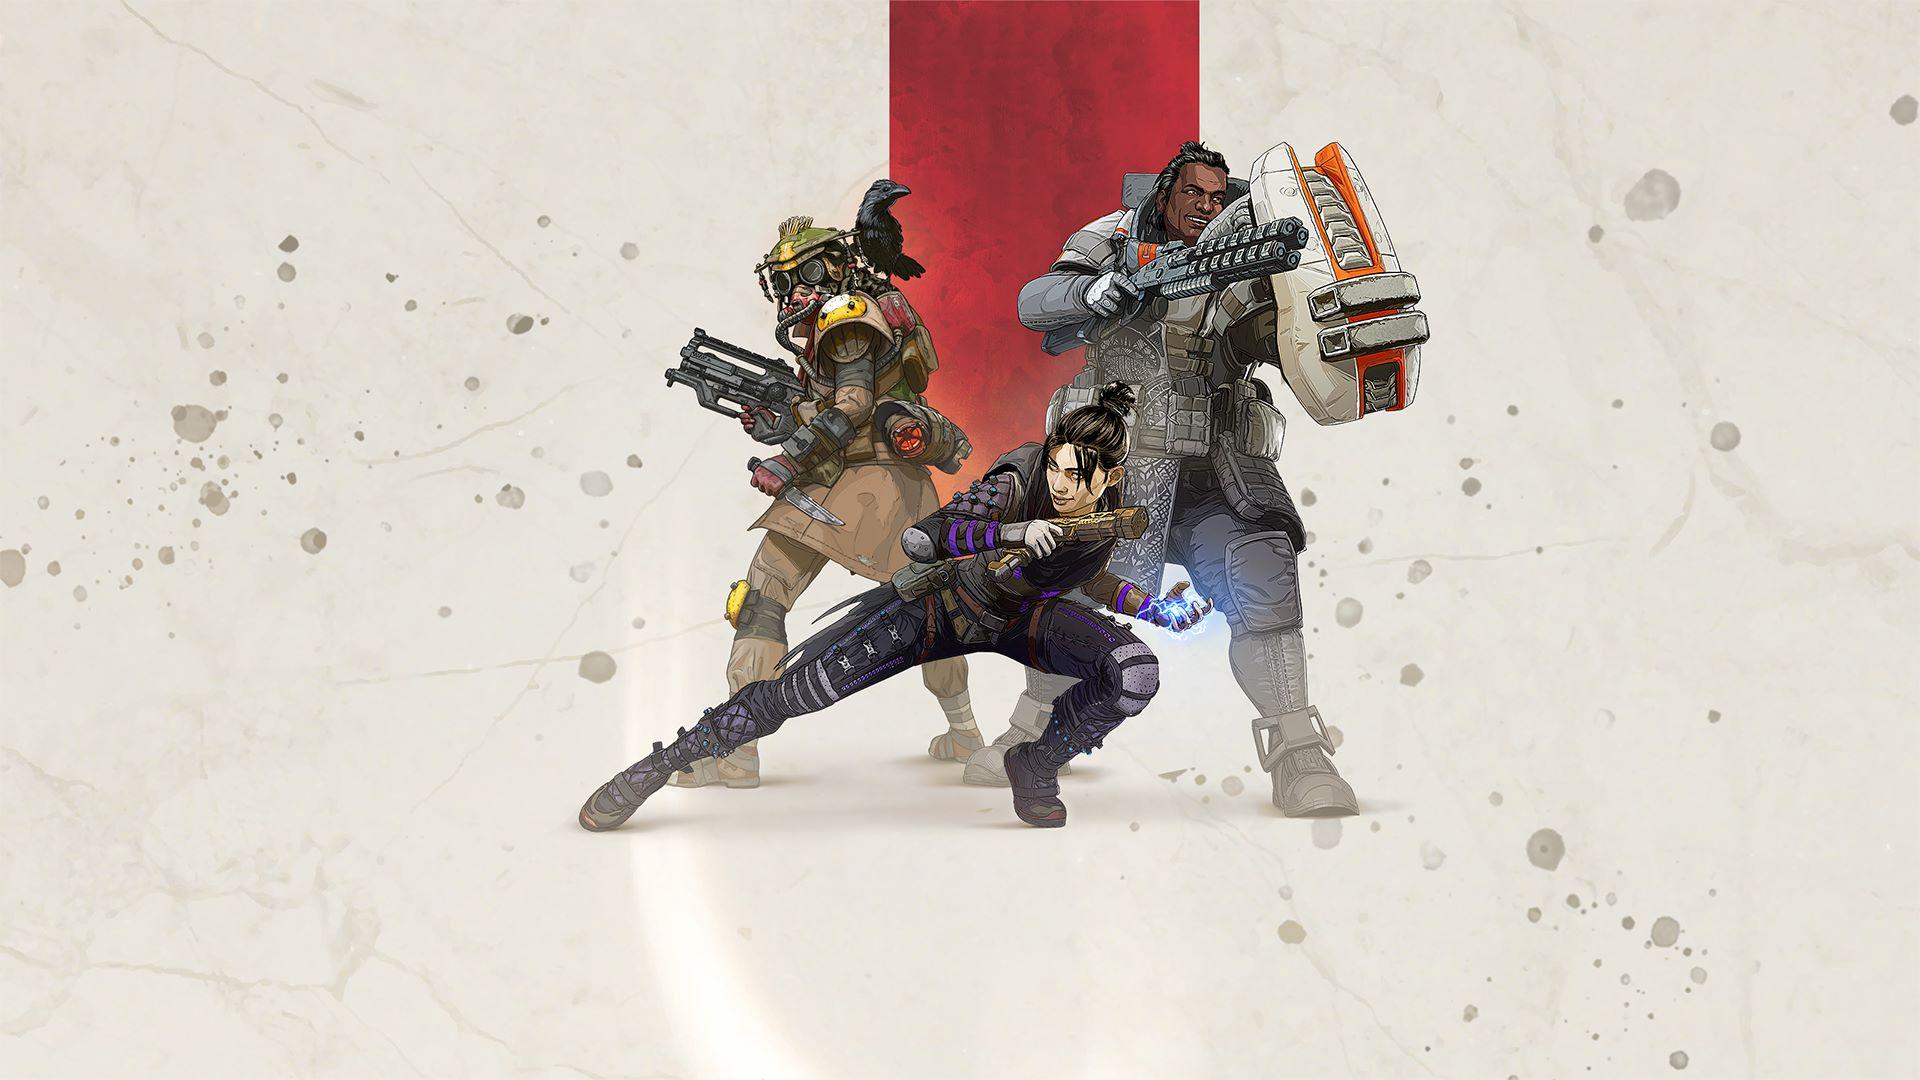 Review in Progress: Apex Legends screenshot